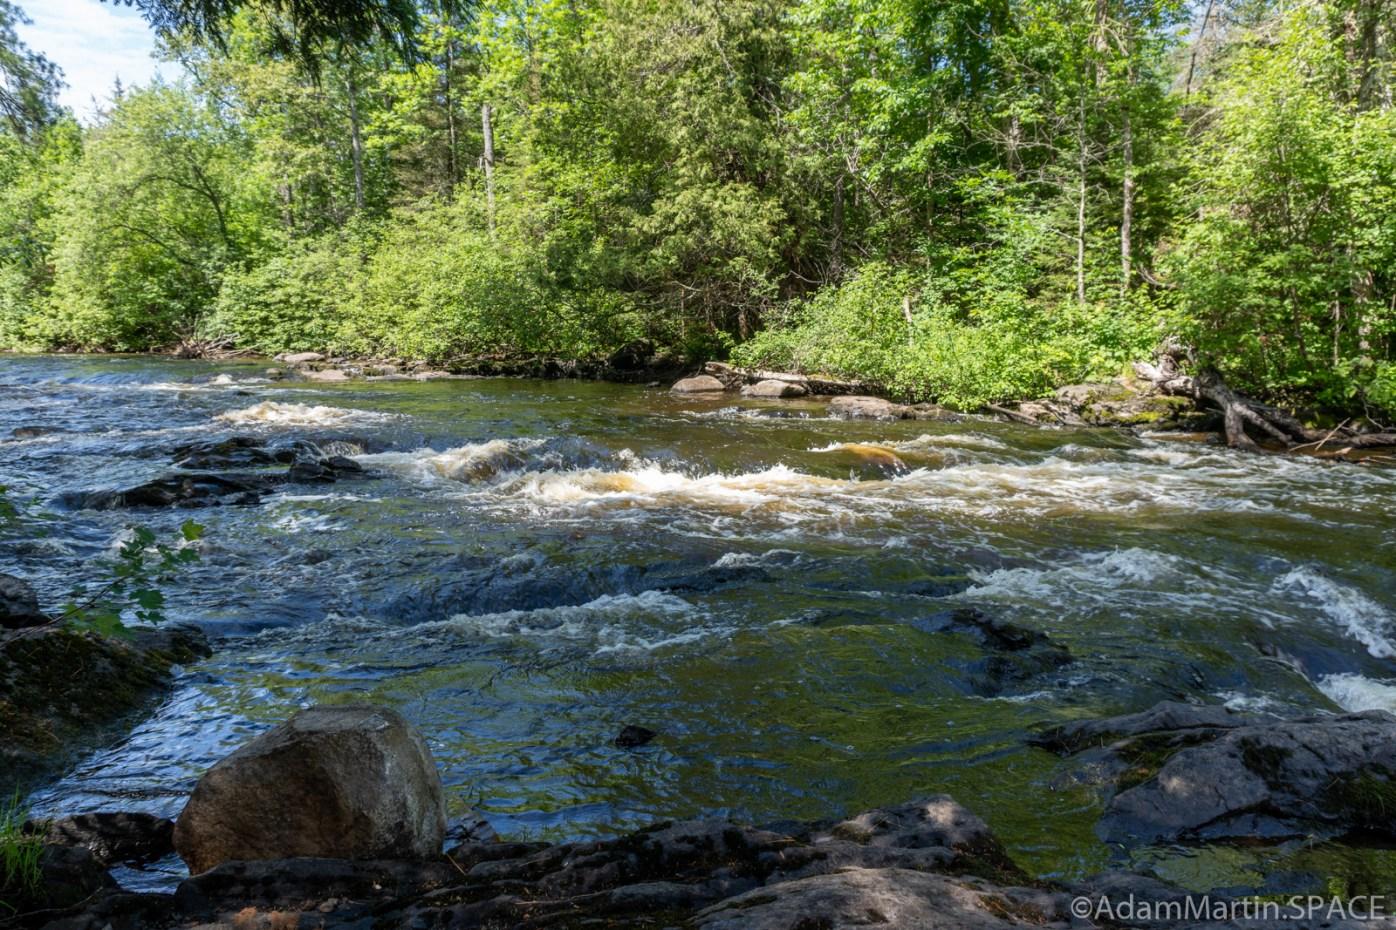 Washburn Falls - Upstream view